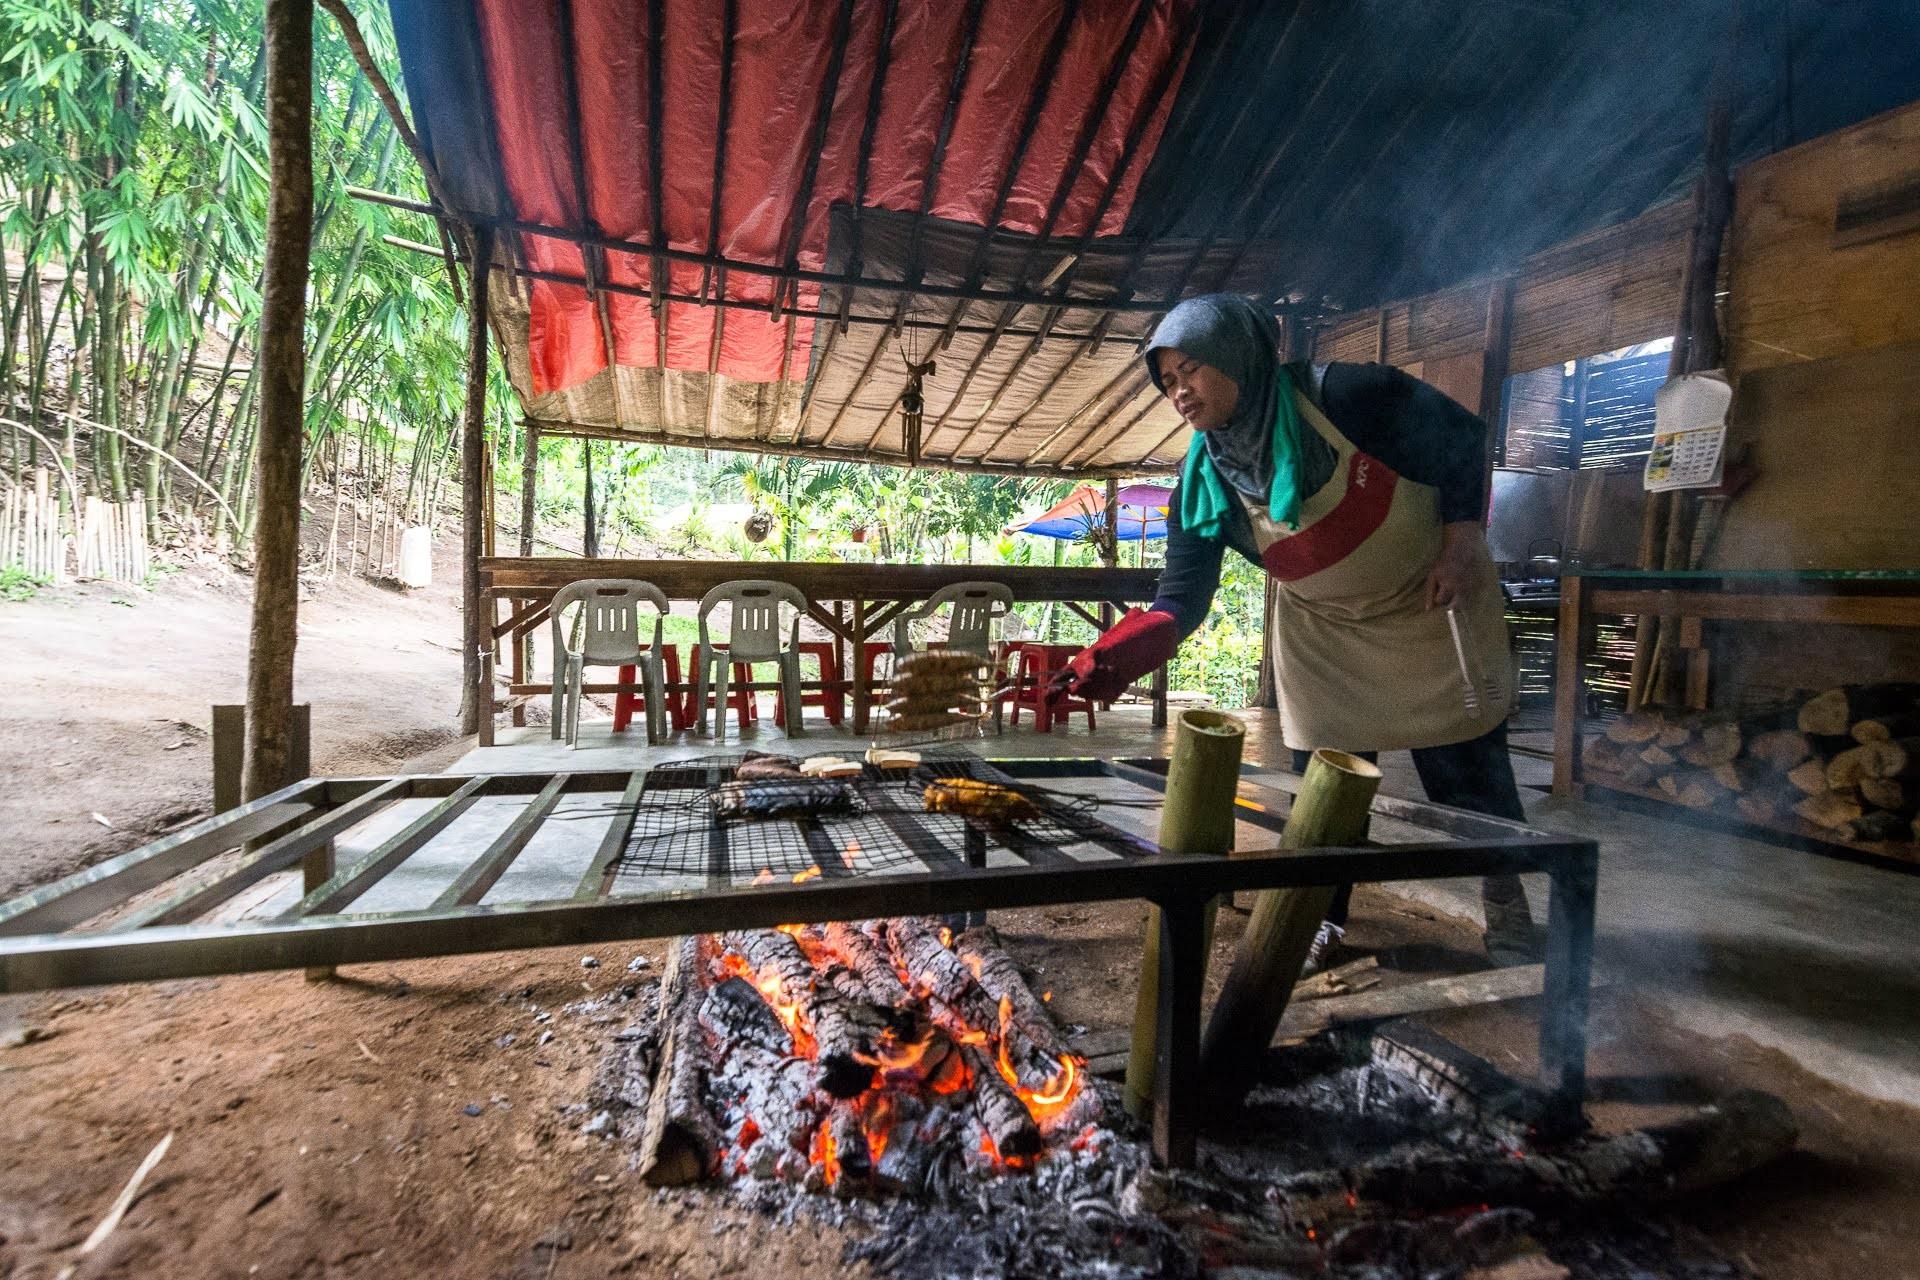 Jídlo v Malajsii - Malajsie cestopis, Martin Šístek